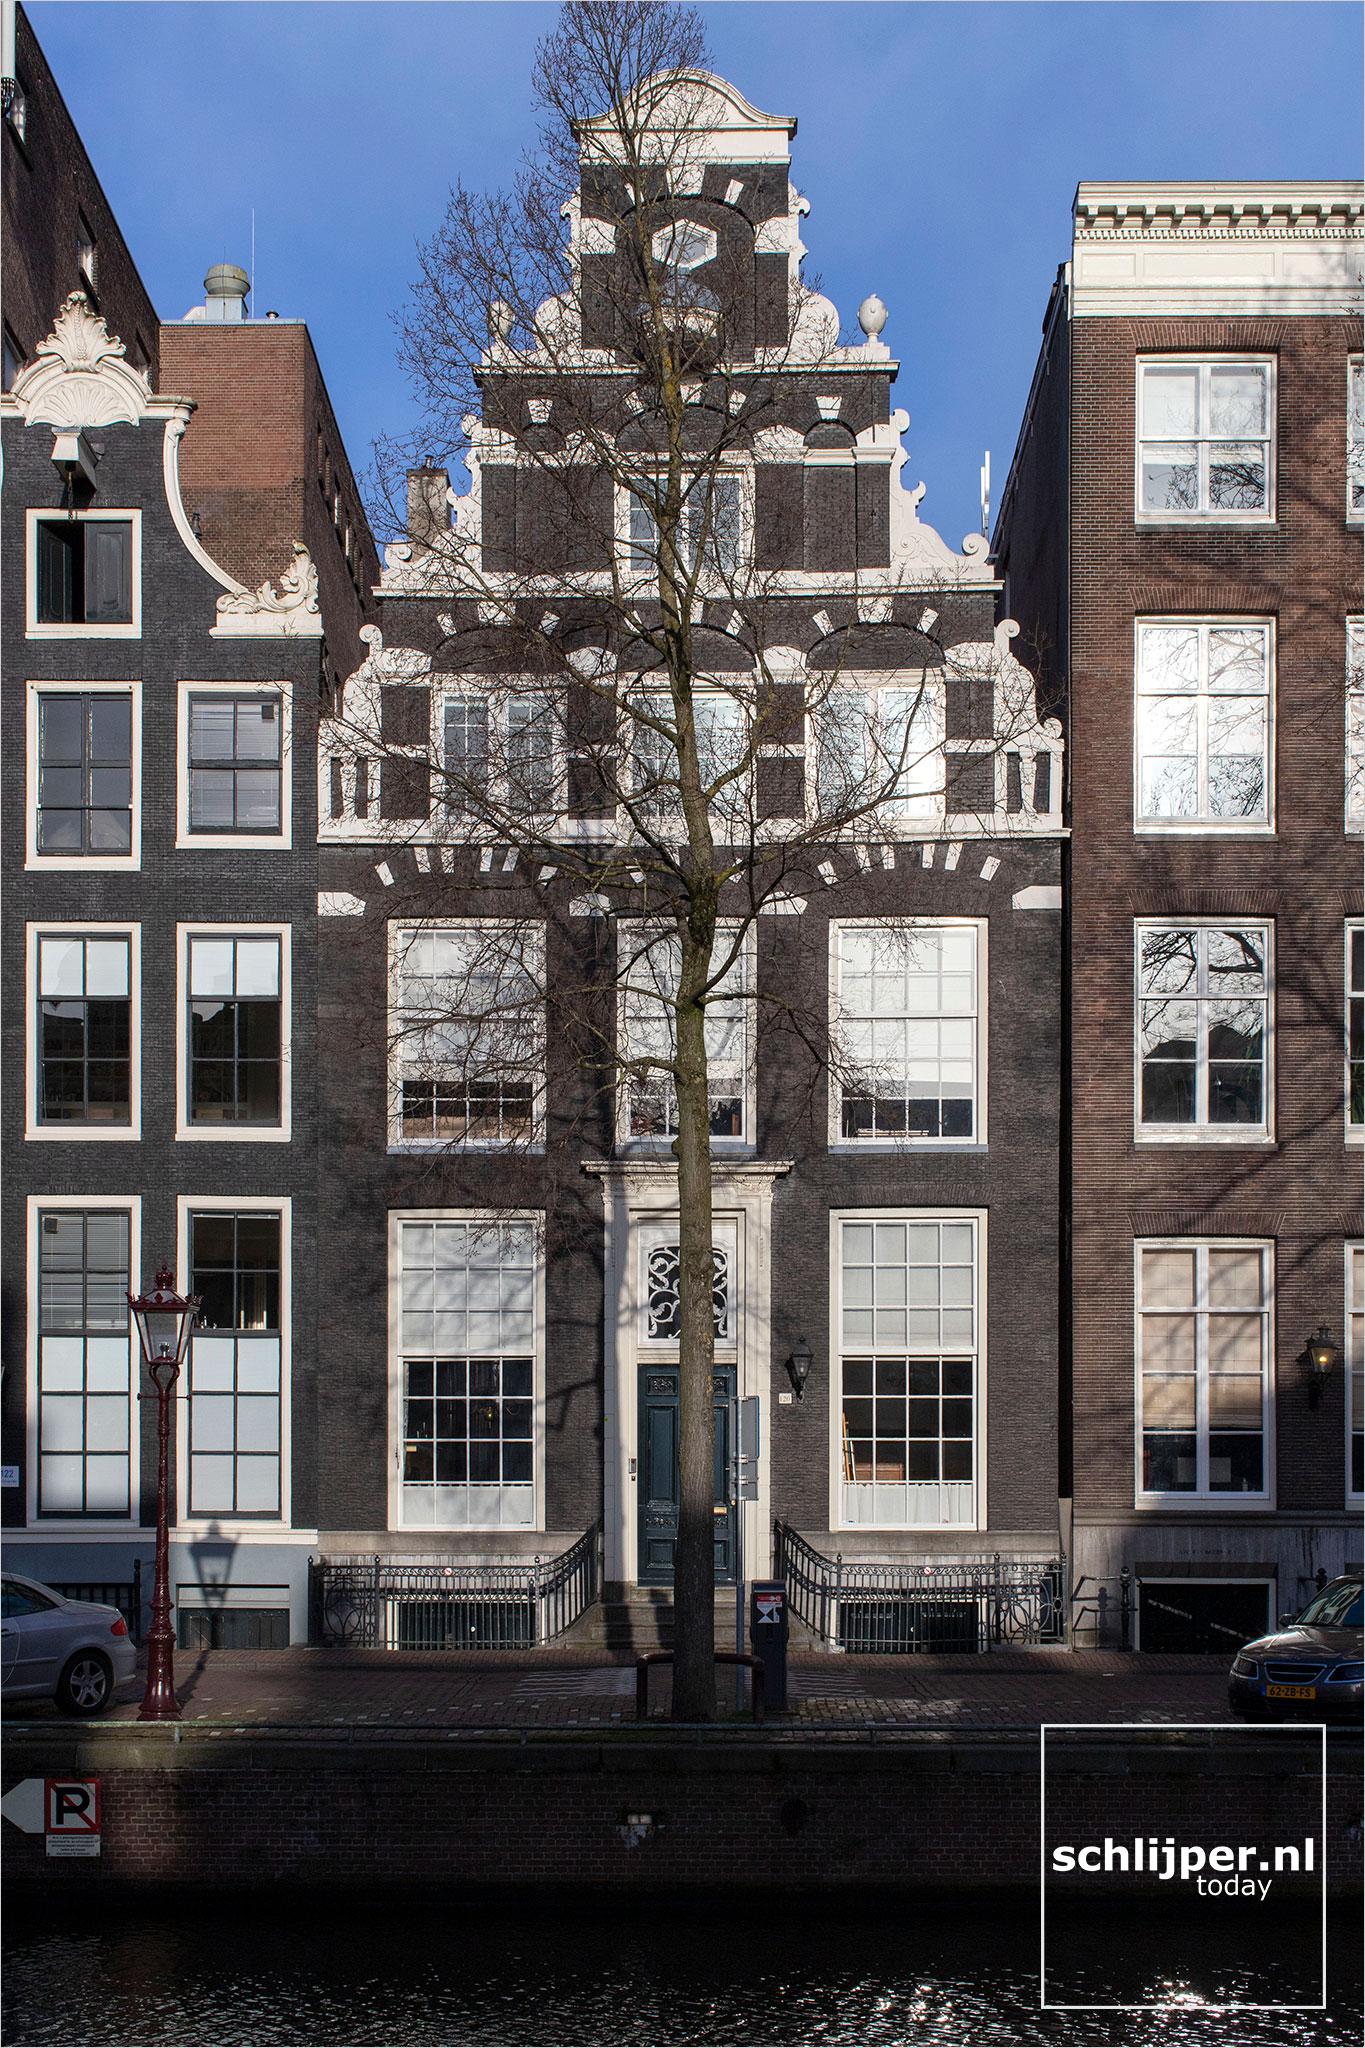 The Netherlands, Amsterdam, 12 maart 2021